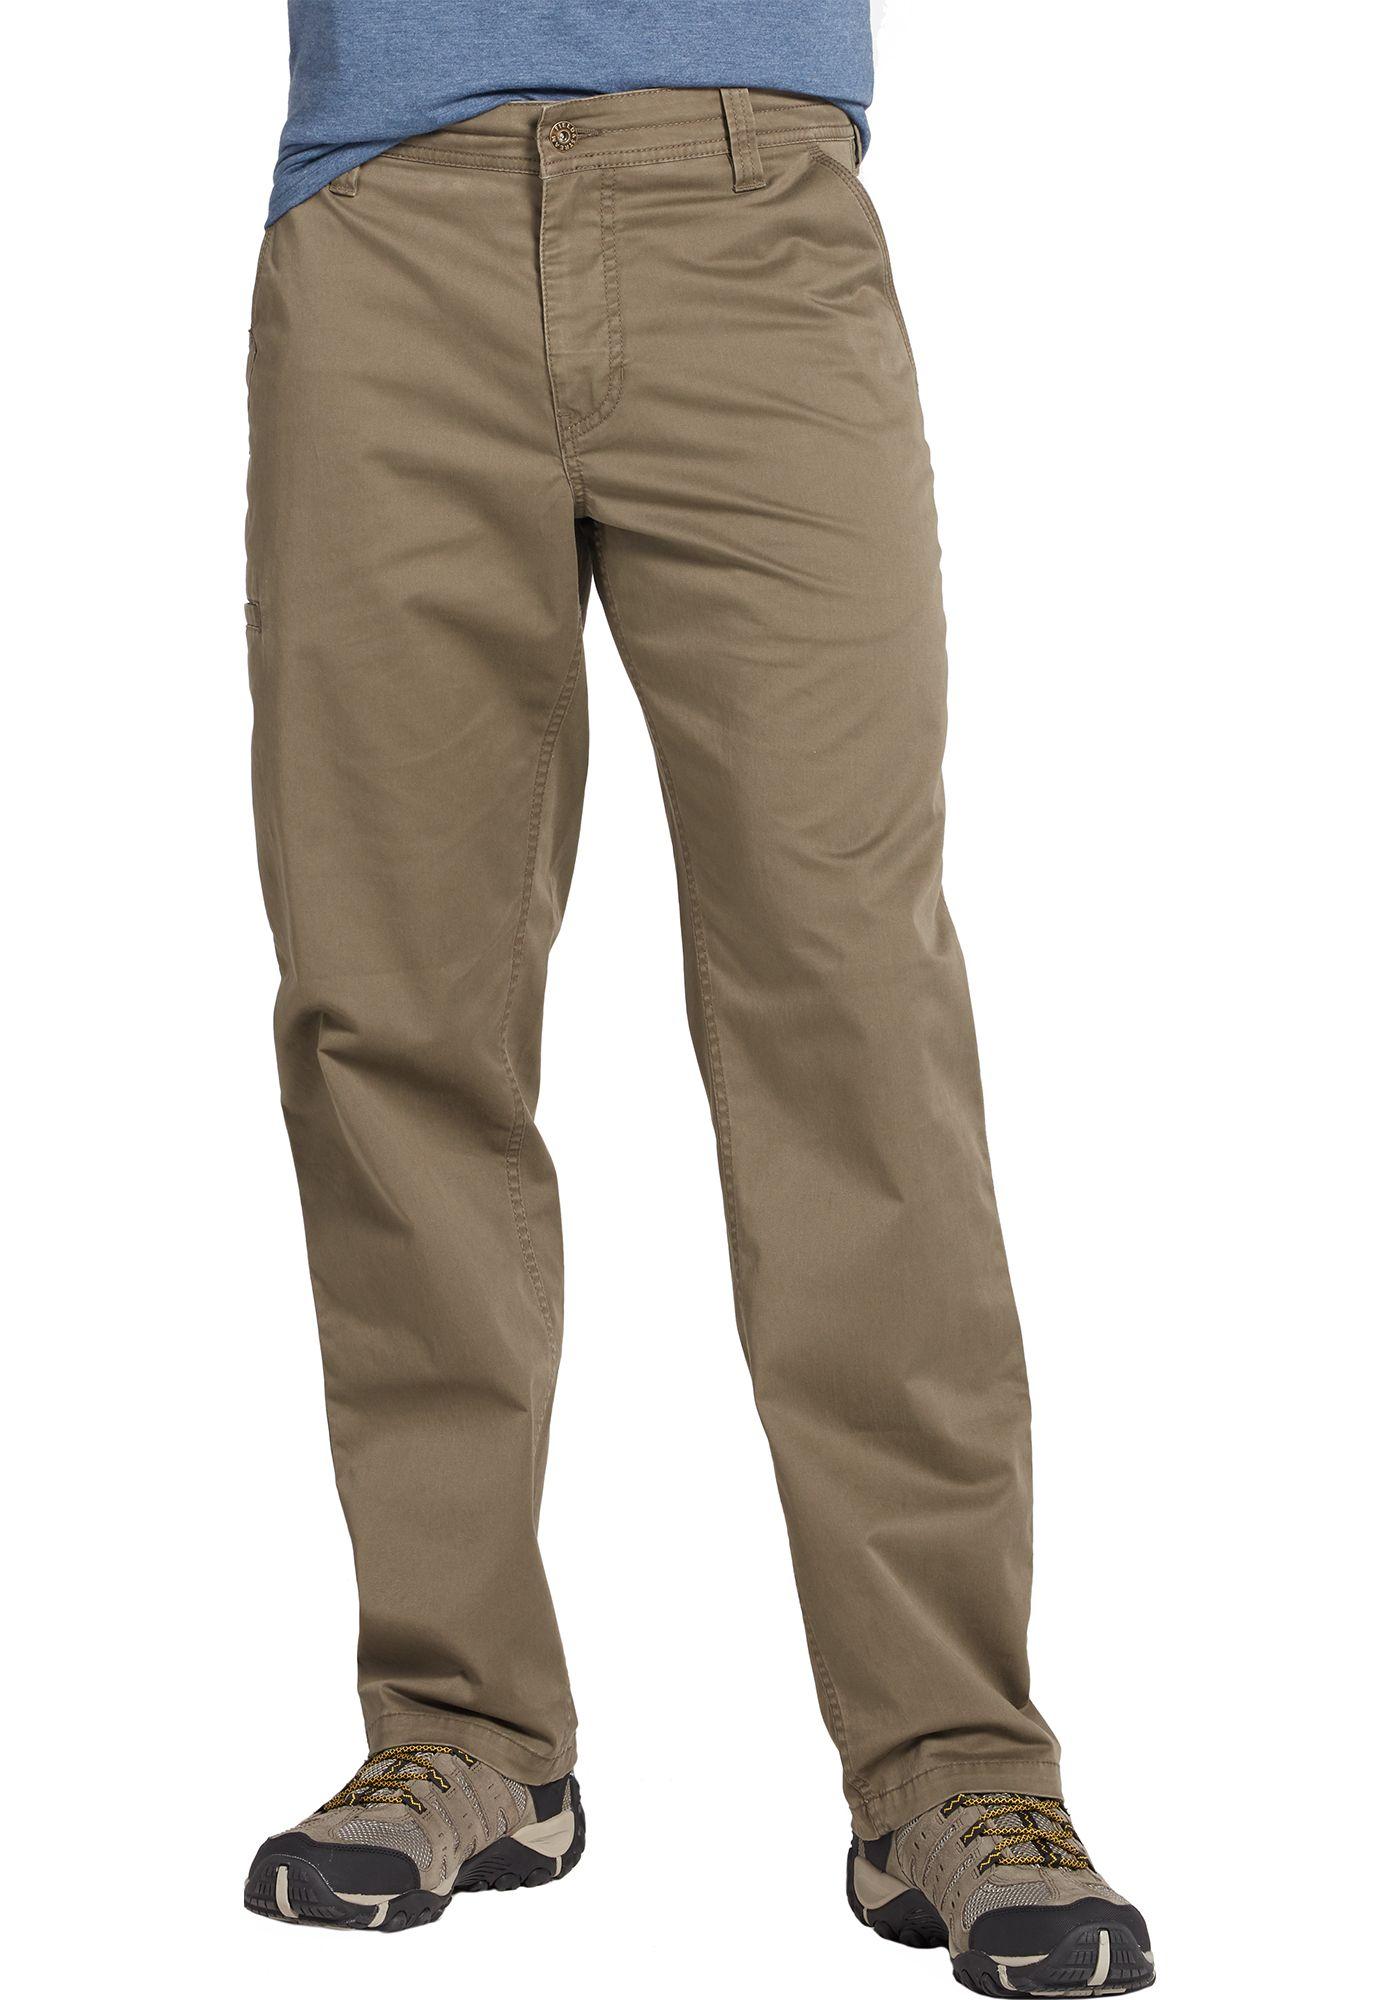 Field & Stream Men's Stretch Utility Pants